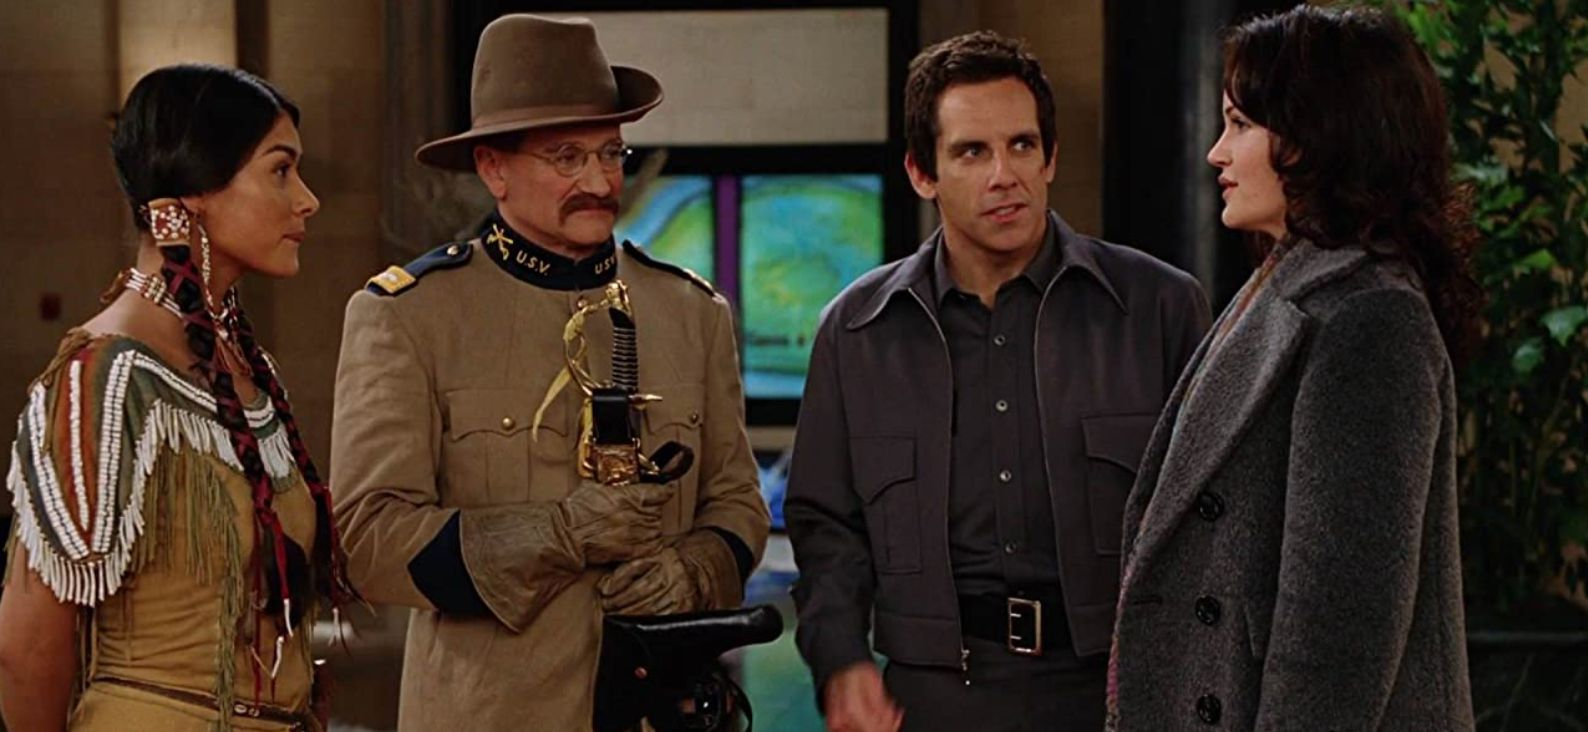 Robin Williams, Carla Gugino, Ben Stiller, and Mizuo Peck in 'Night at the Museum'